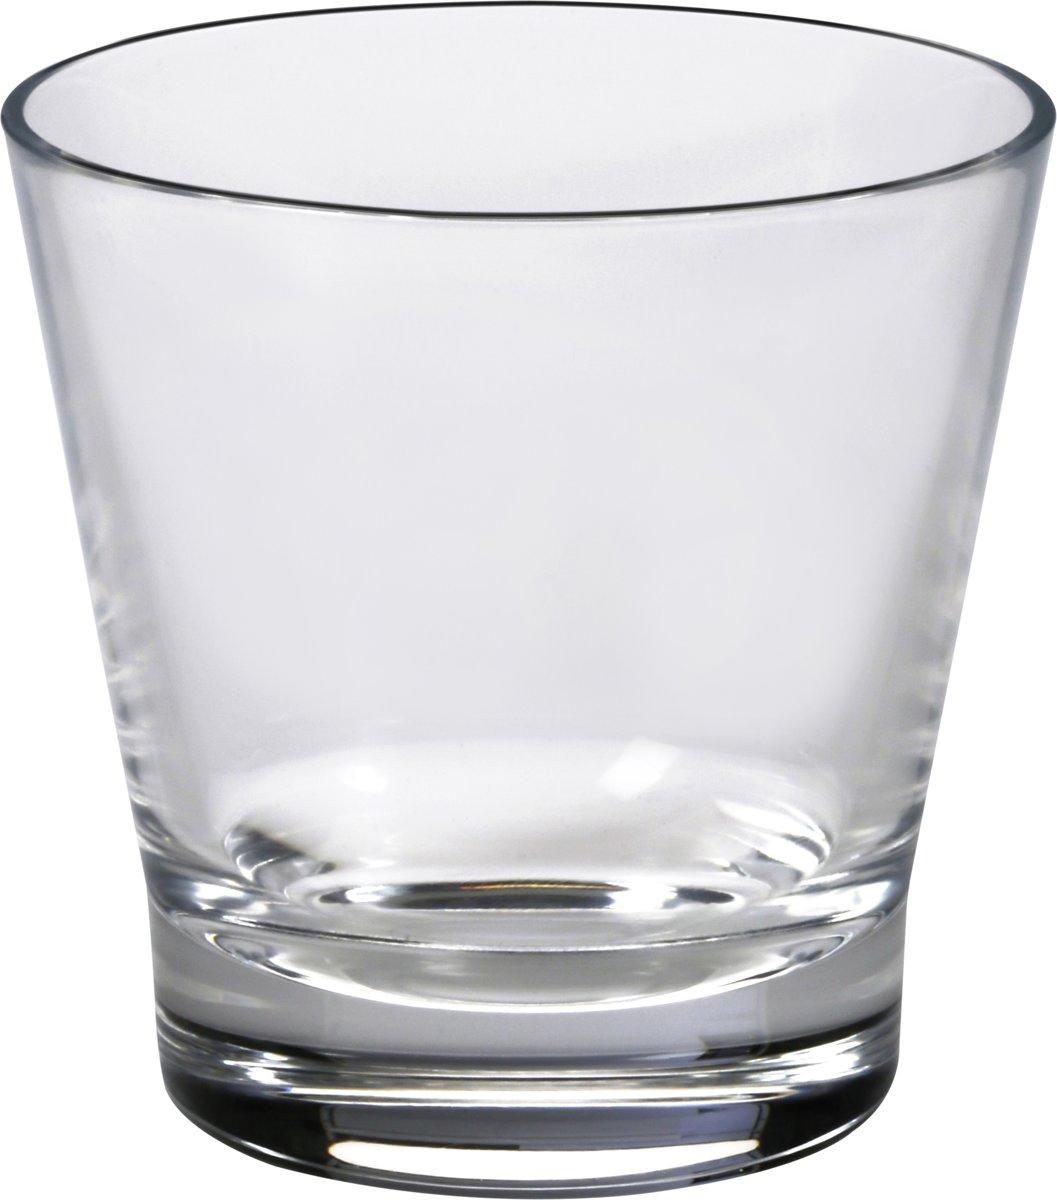 Duralex Pure Clear Tumblerglas - 21 cl - 6 stuks kopen